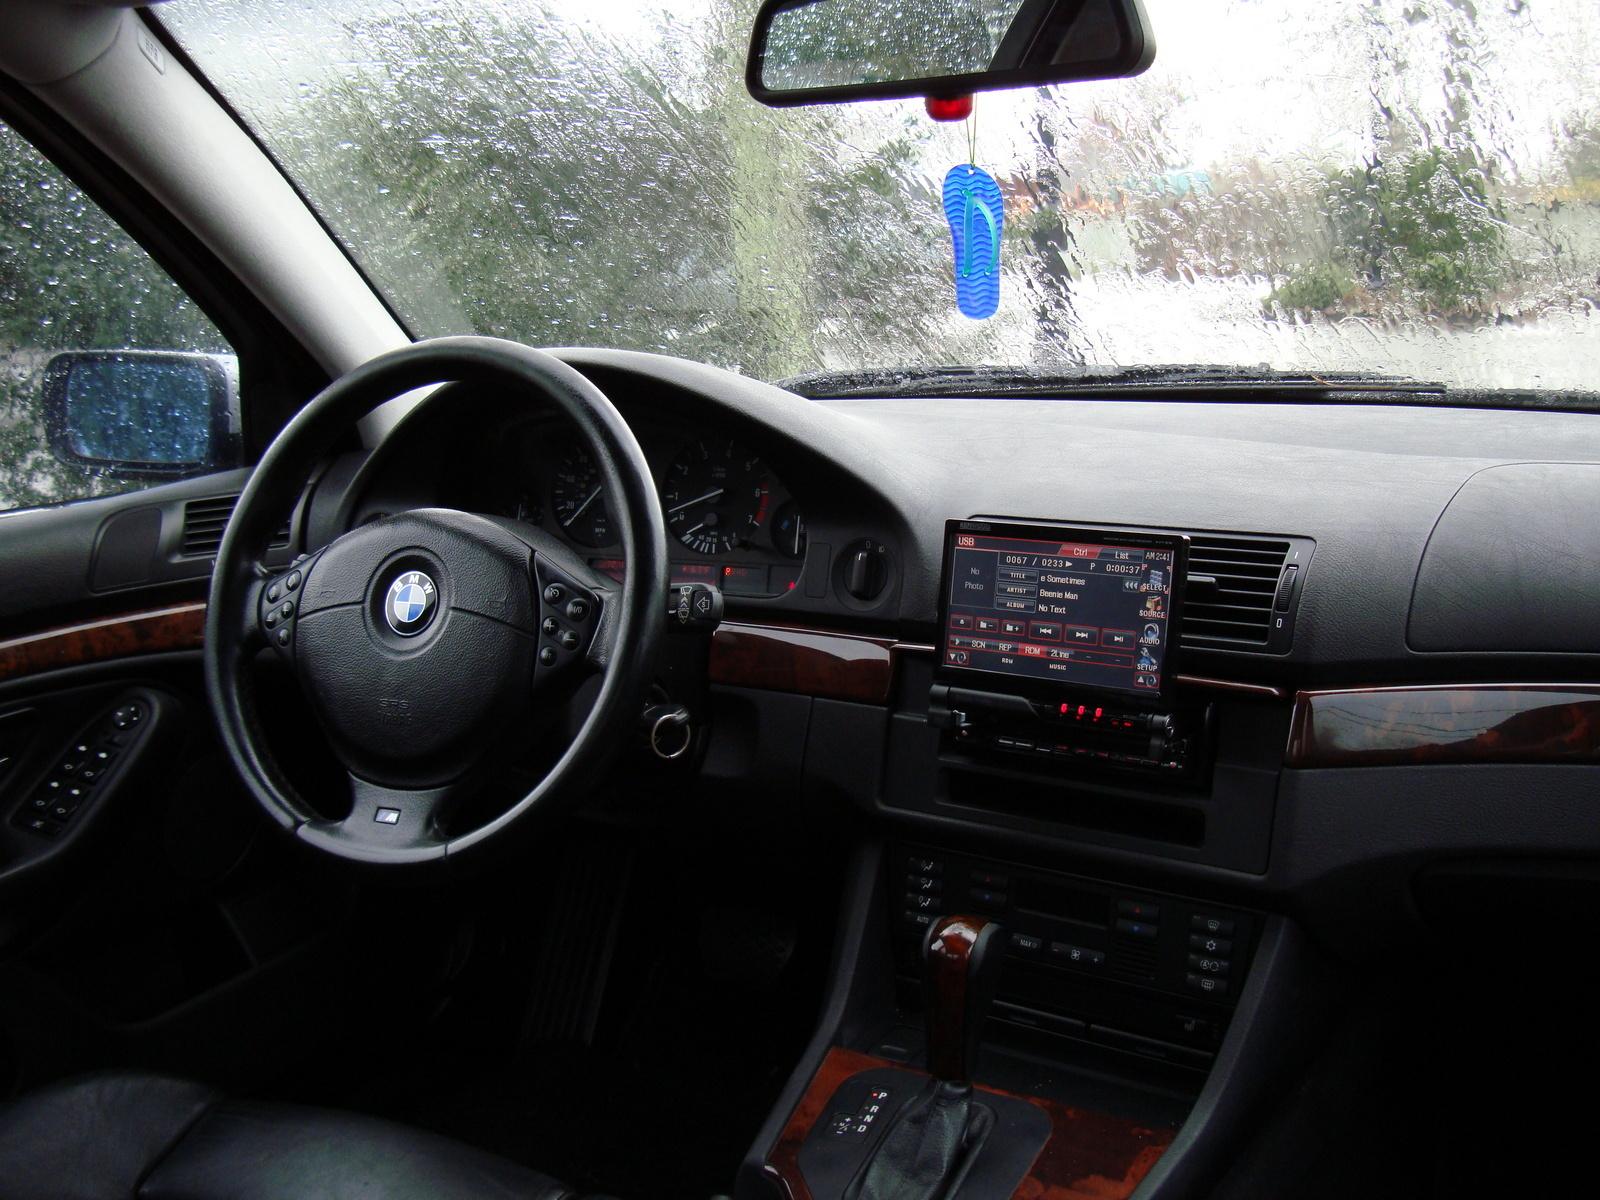 hight resolution of 2000 bmw 540i interior